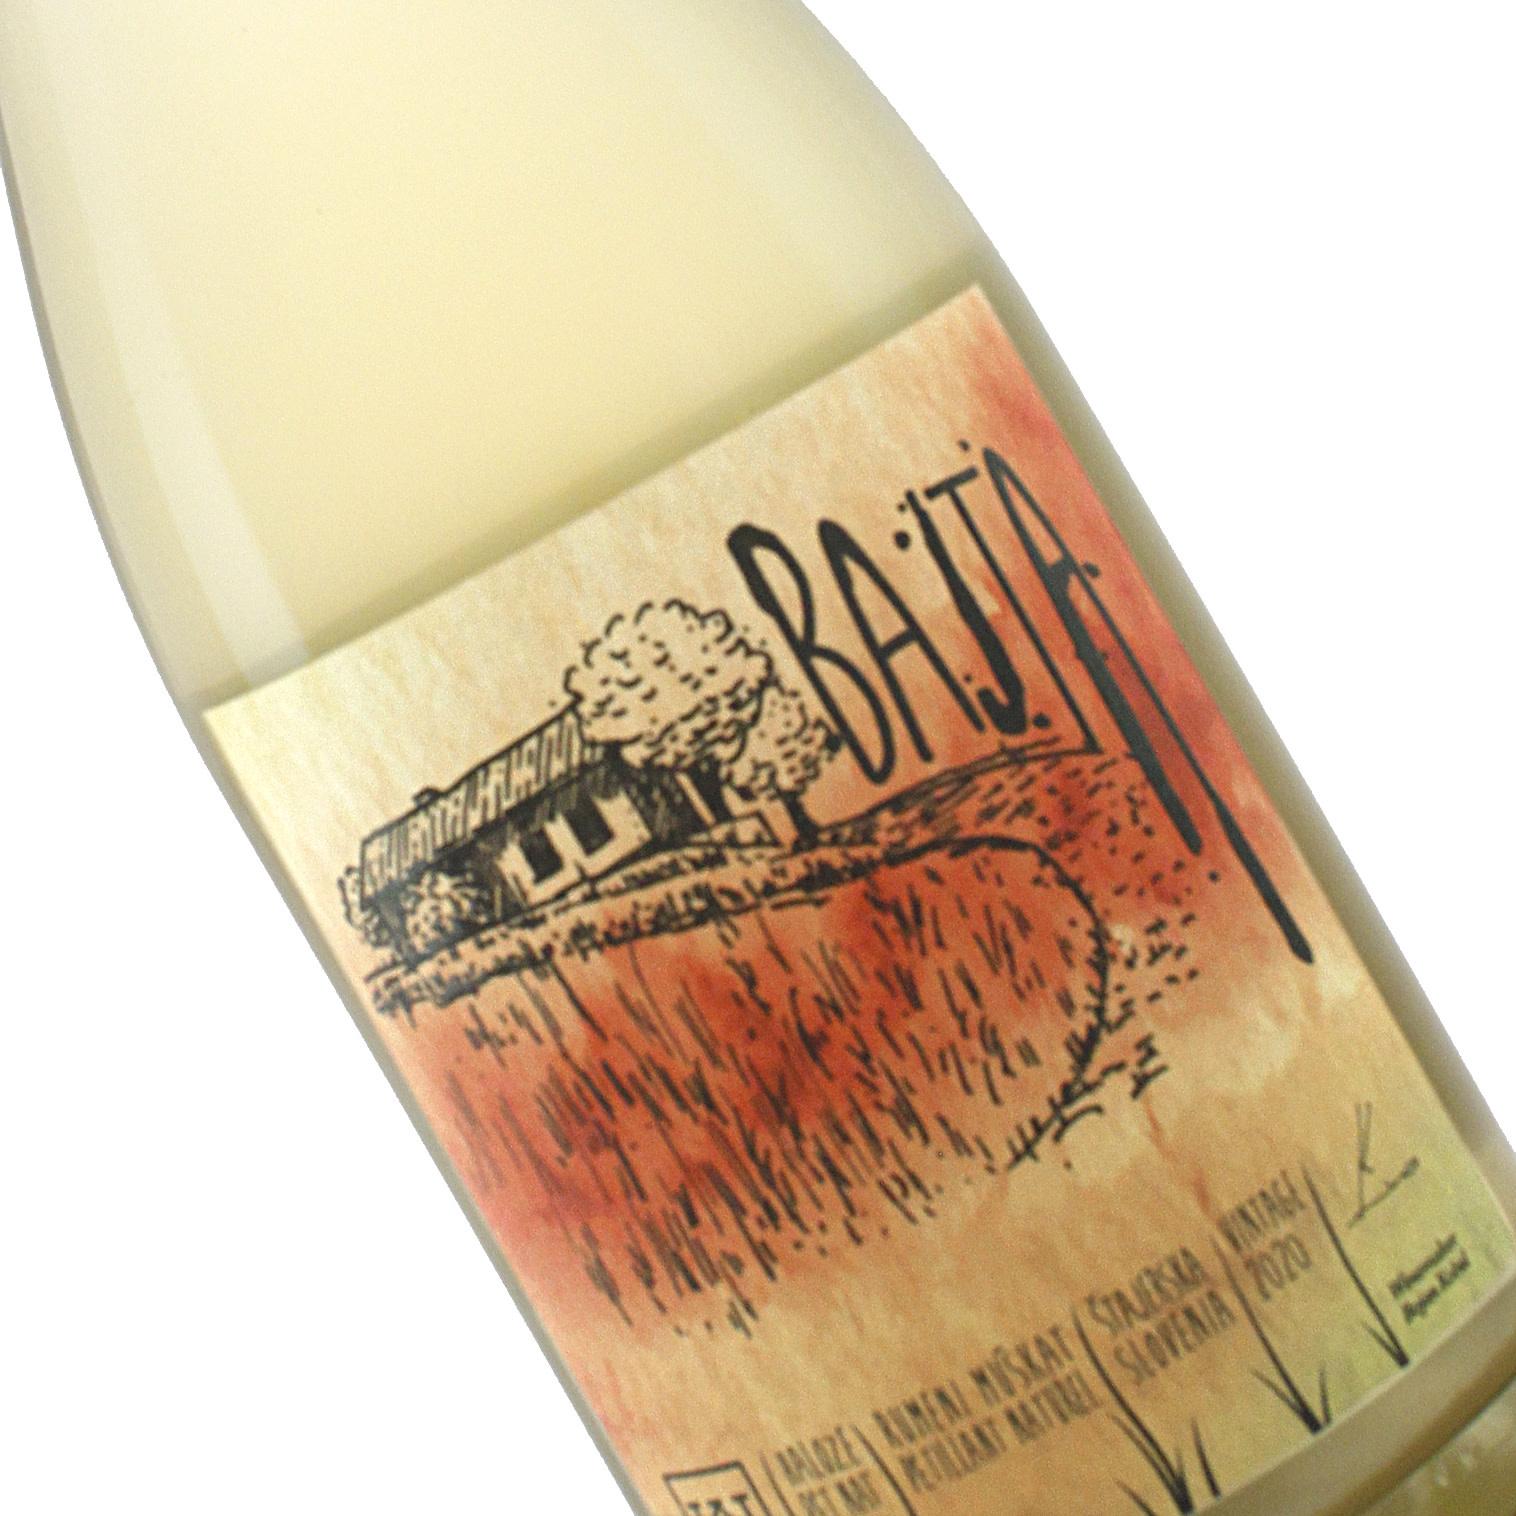 Kobal 2020 Bajta Muskat Pet-Nat Sparkling Wine, Slovenia